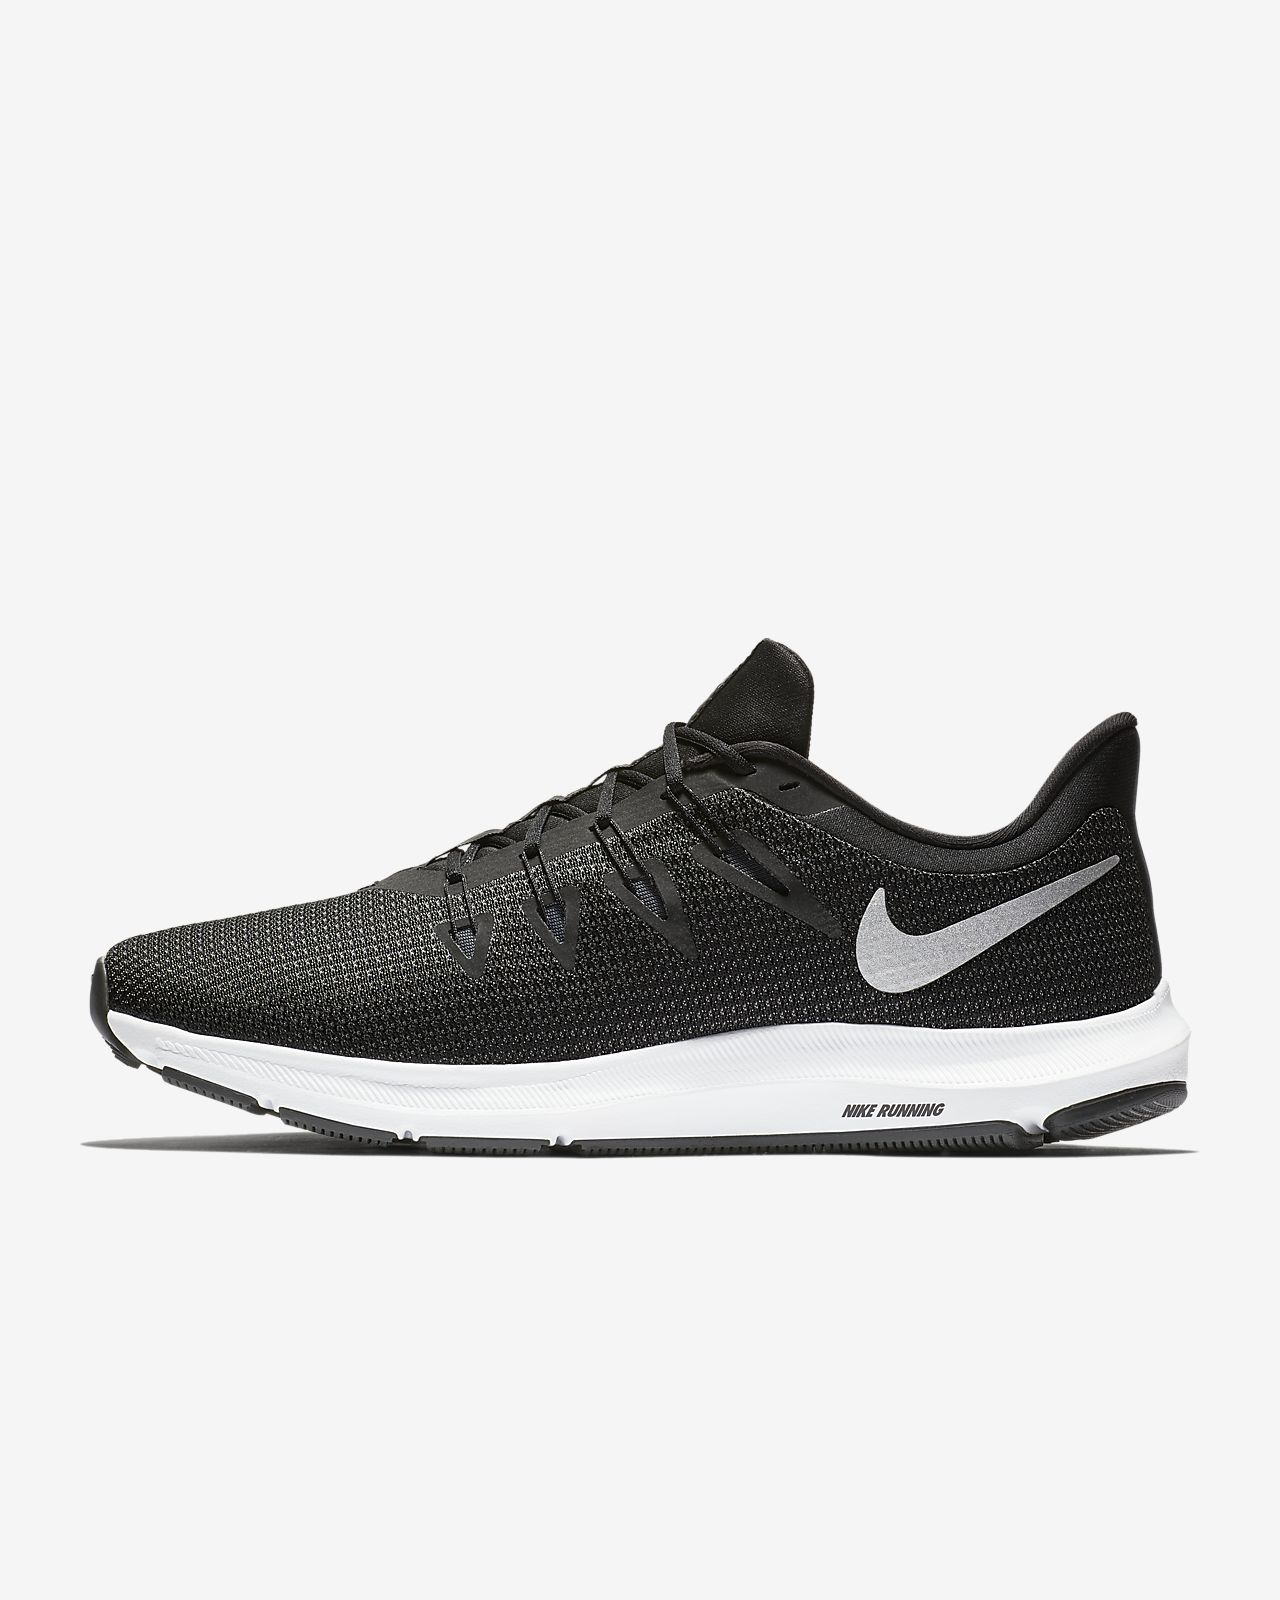 quality design 814bd 65ab2 ... Nike Quest Herren-Laufschuh